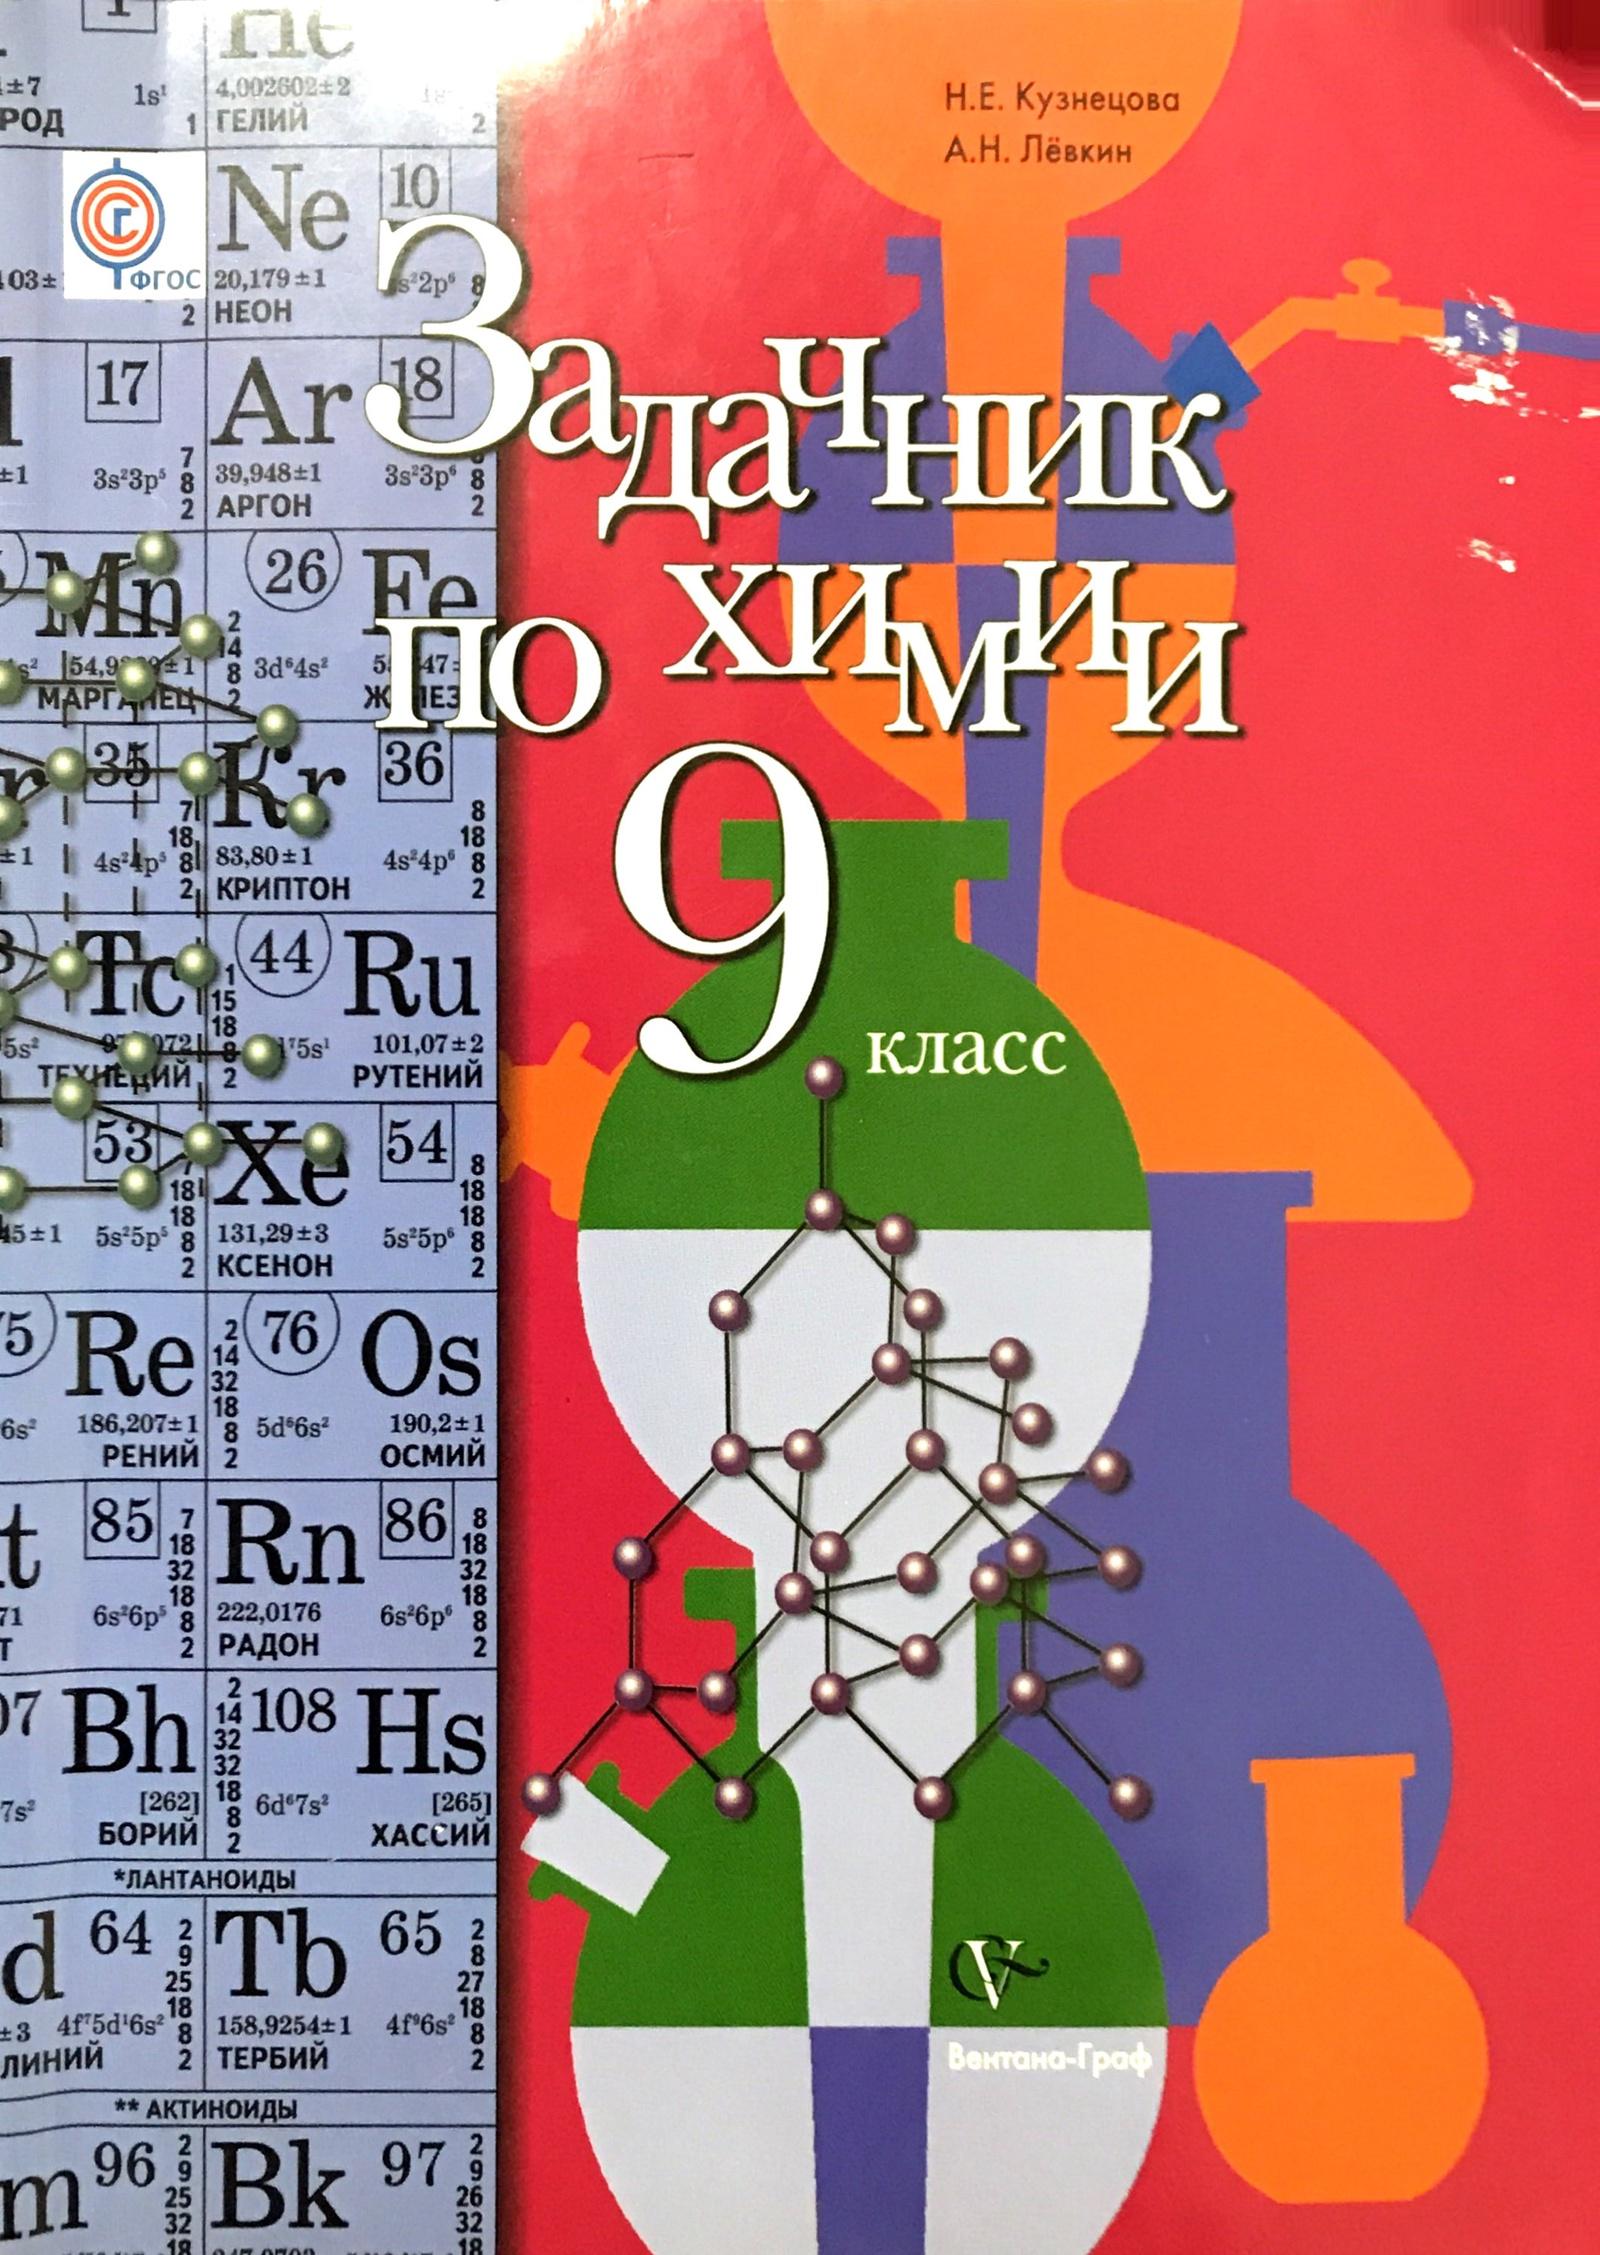 Н. Е. Кузнецова, А. Н. Левкин Химия. Задачник. 9 класс